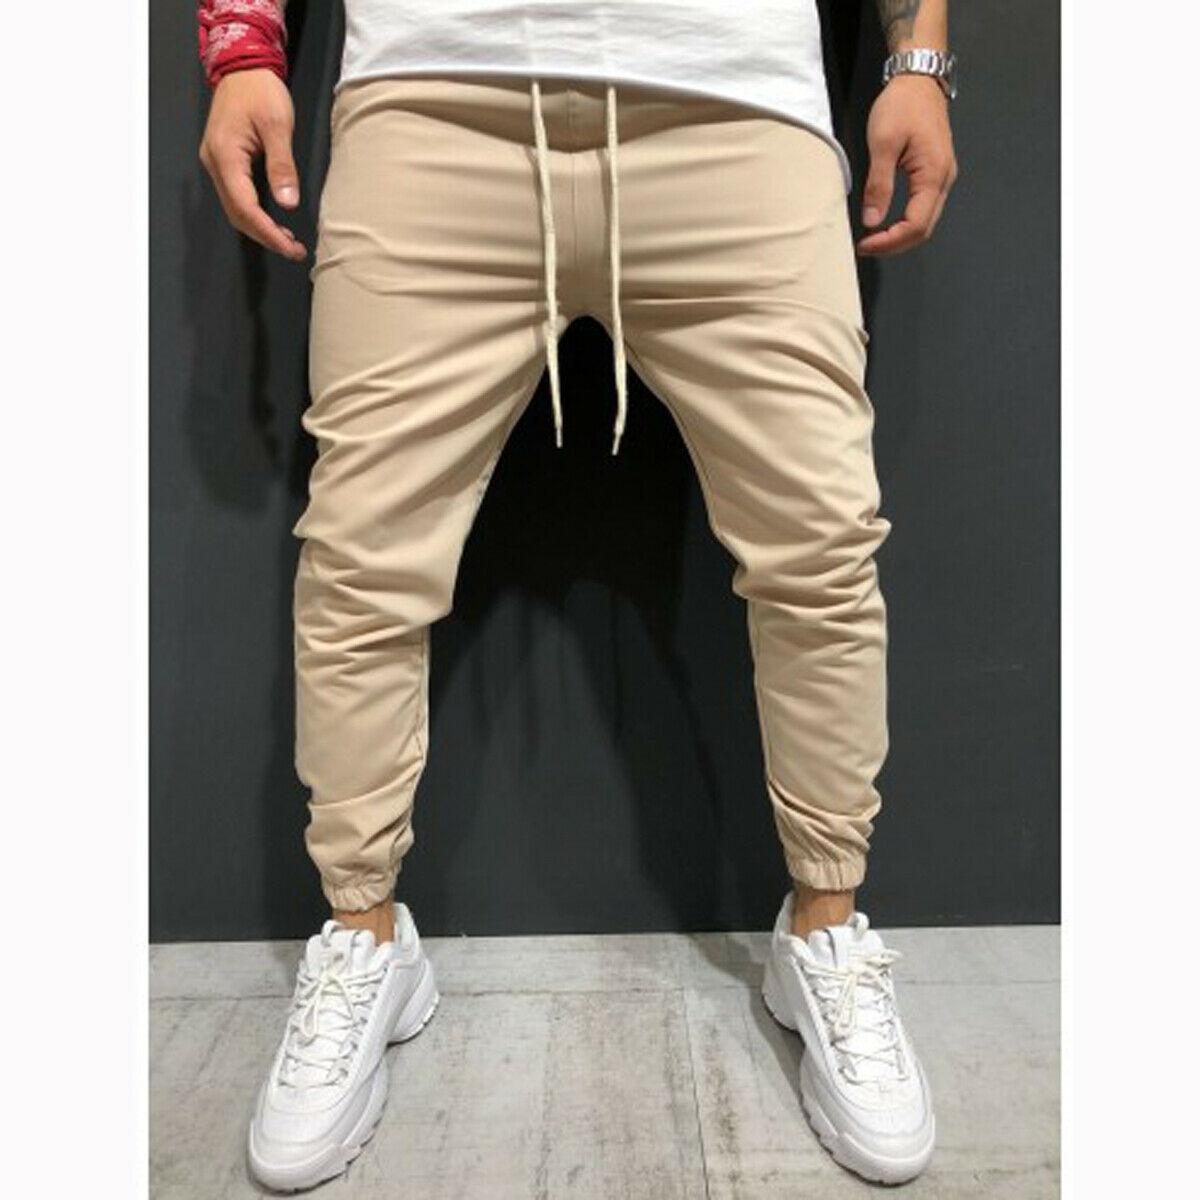 Mens Casual Slim Fit Tracksuit Sport Skinny Jogging Joggers Sweat Pants Trousers Sweatpants Black Blue Gray Green Khaki